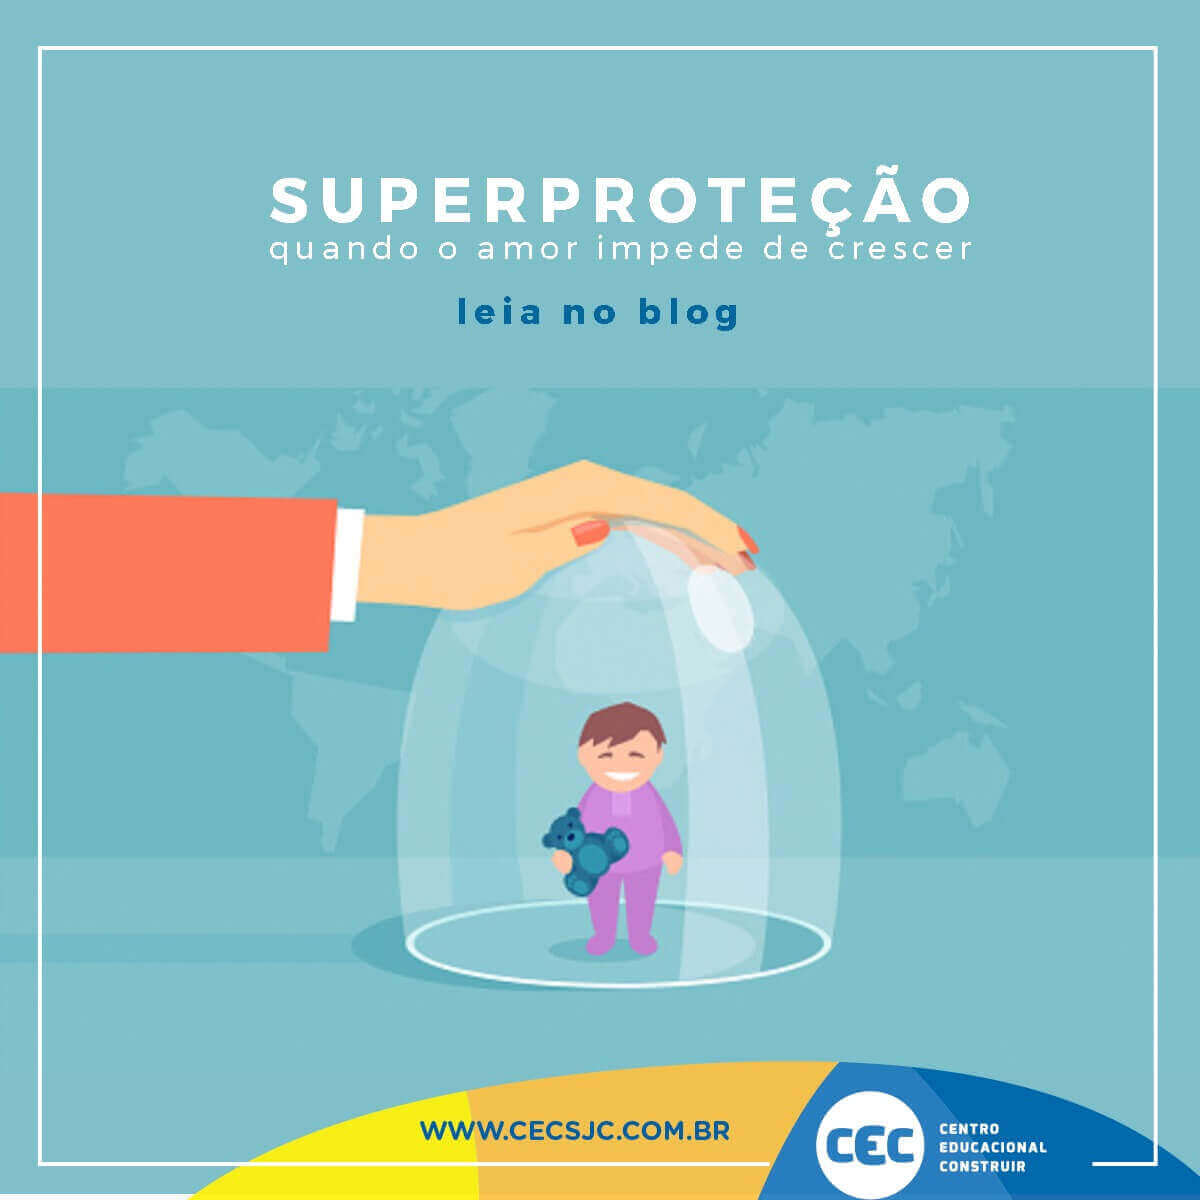 Blog-Superprotecaojpeg-12022020161103.jpeg